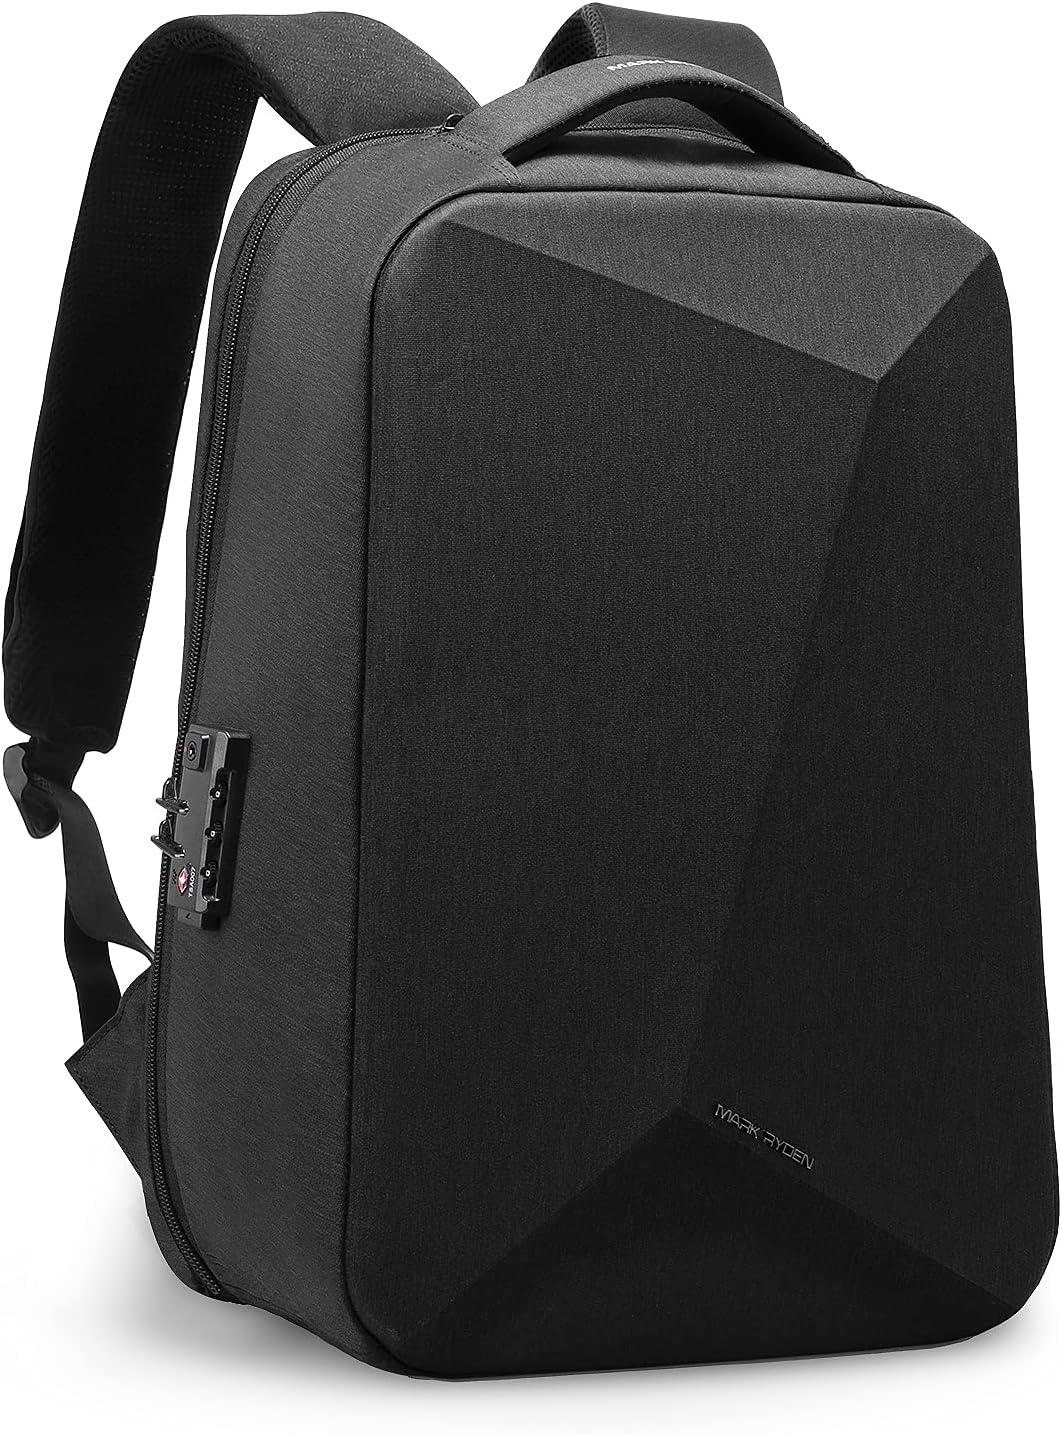 Mark ryden Anti Theft Waterproof Backpack Laptop Backpack 15.6 i